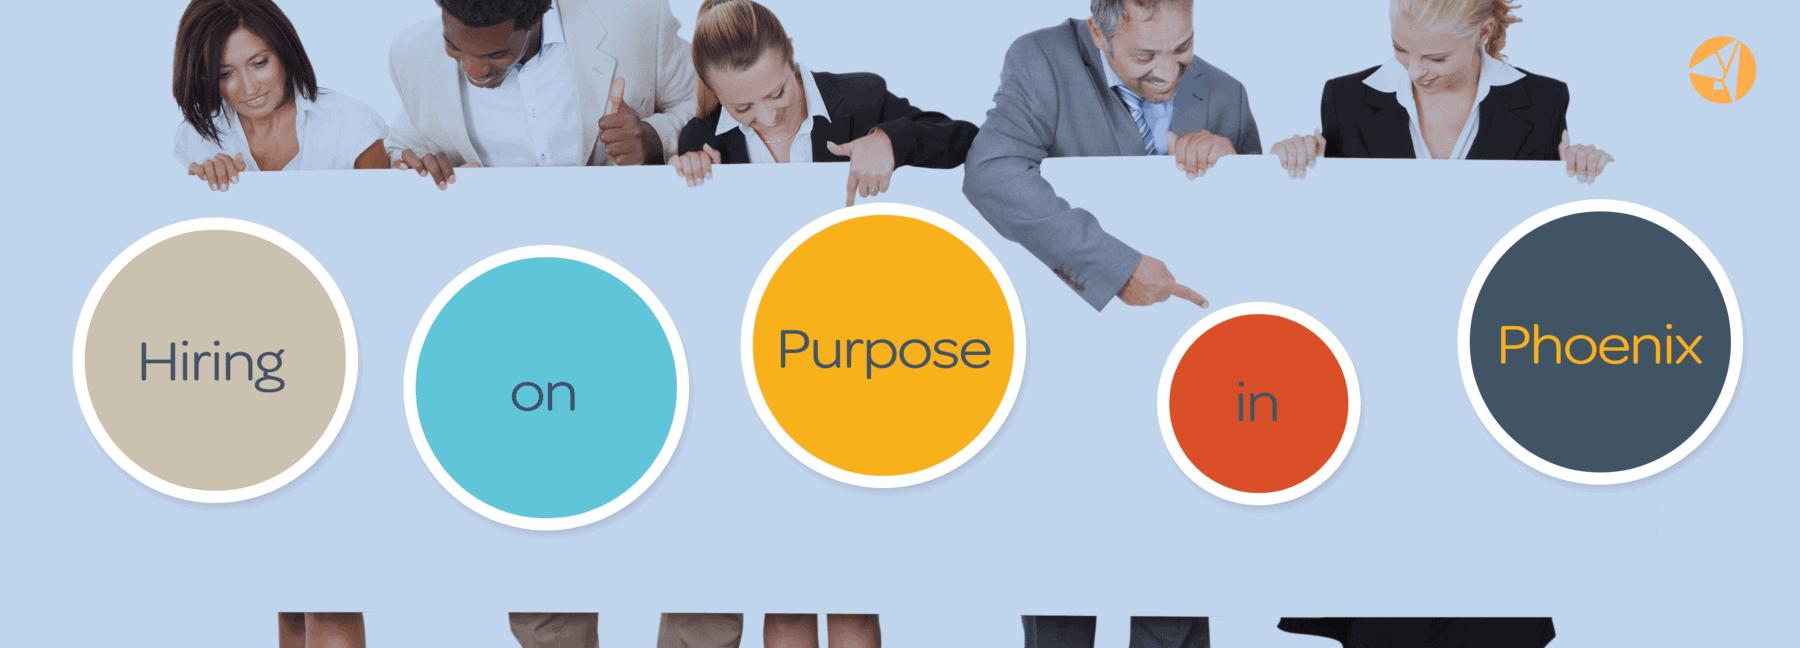 Hiring on Purpose in Phoenix